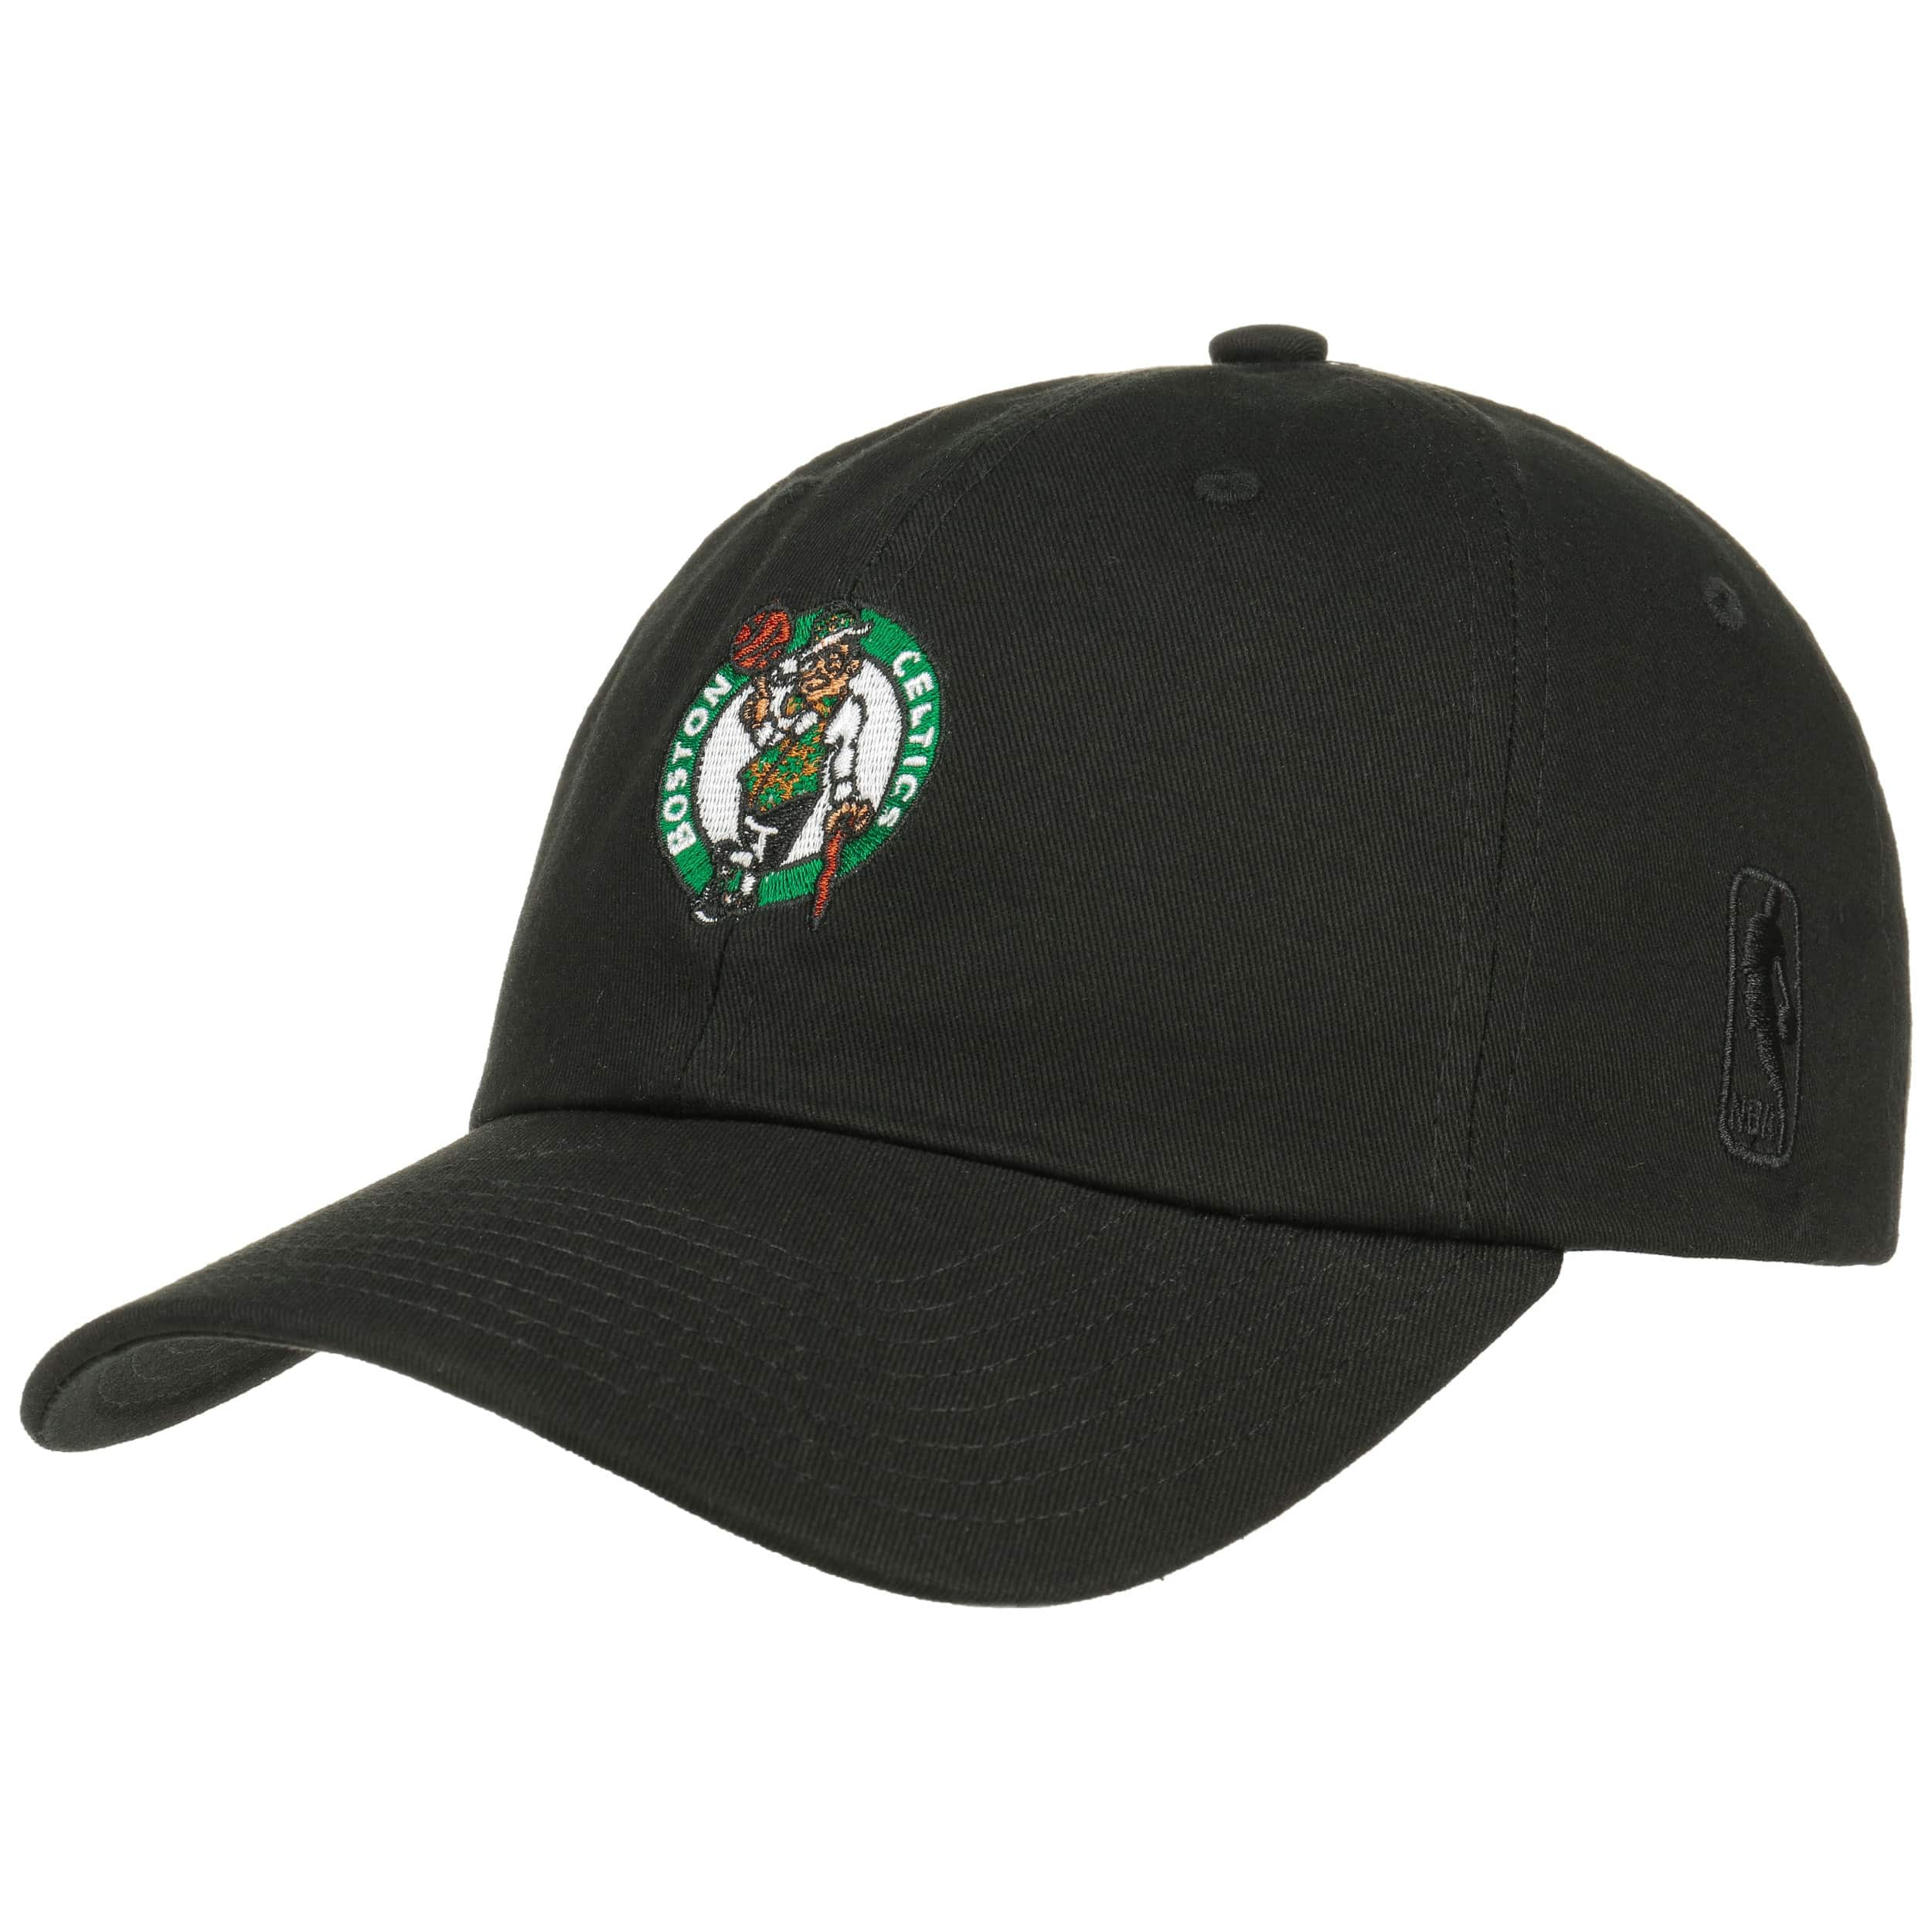 ... Celtics Strapback Cap by Mitchell   Ness - black 6 985c2177421